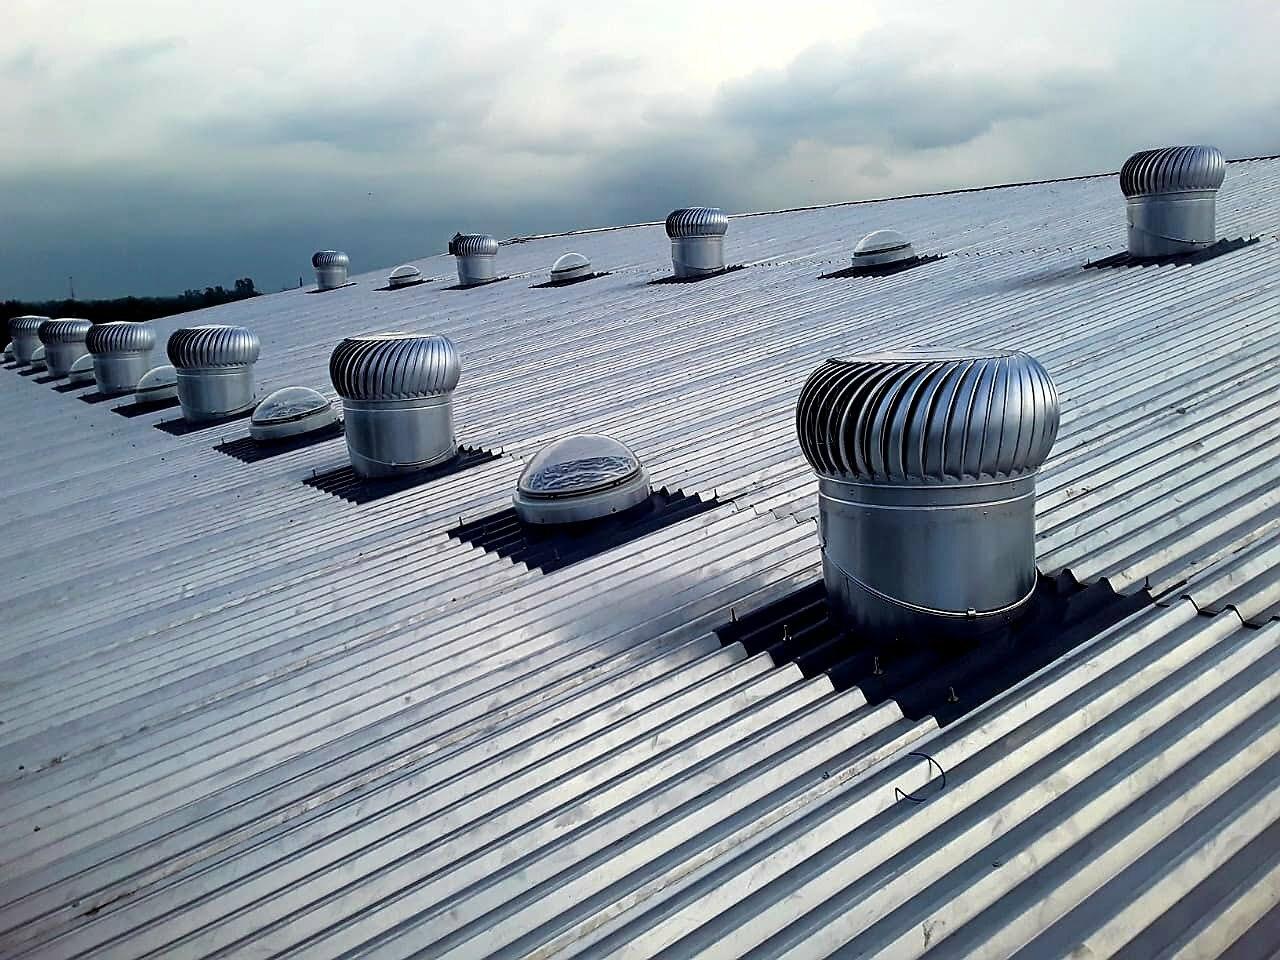 SafeLux500Plus Tubular Daylight_Top View